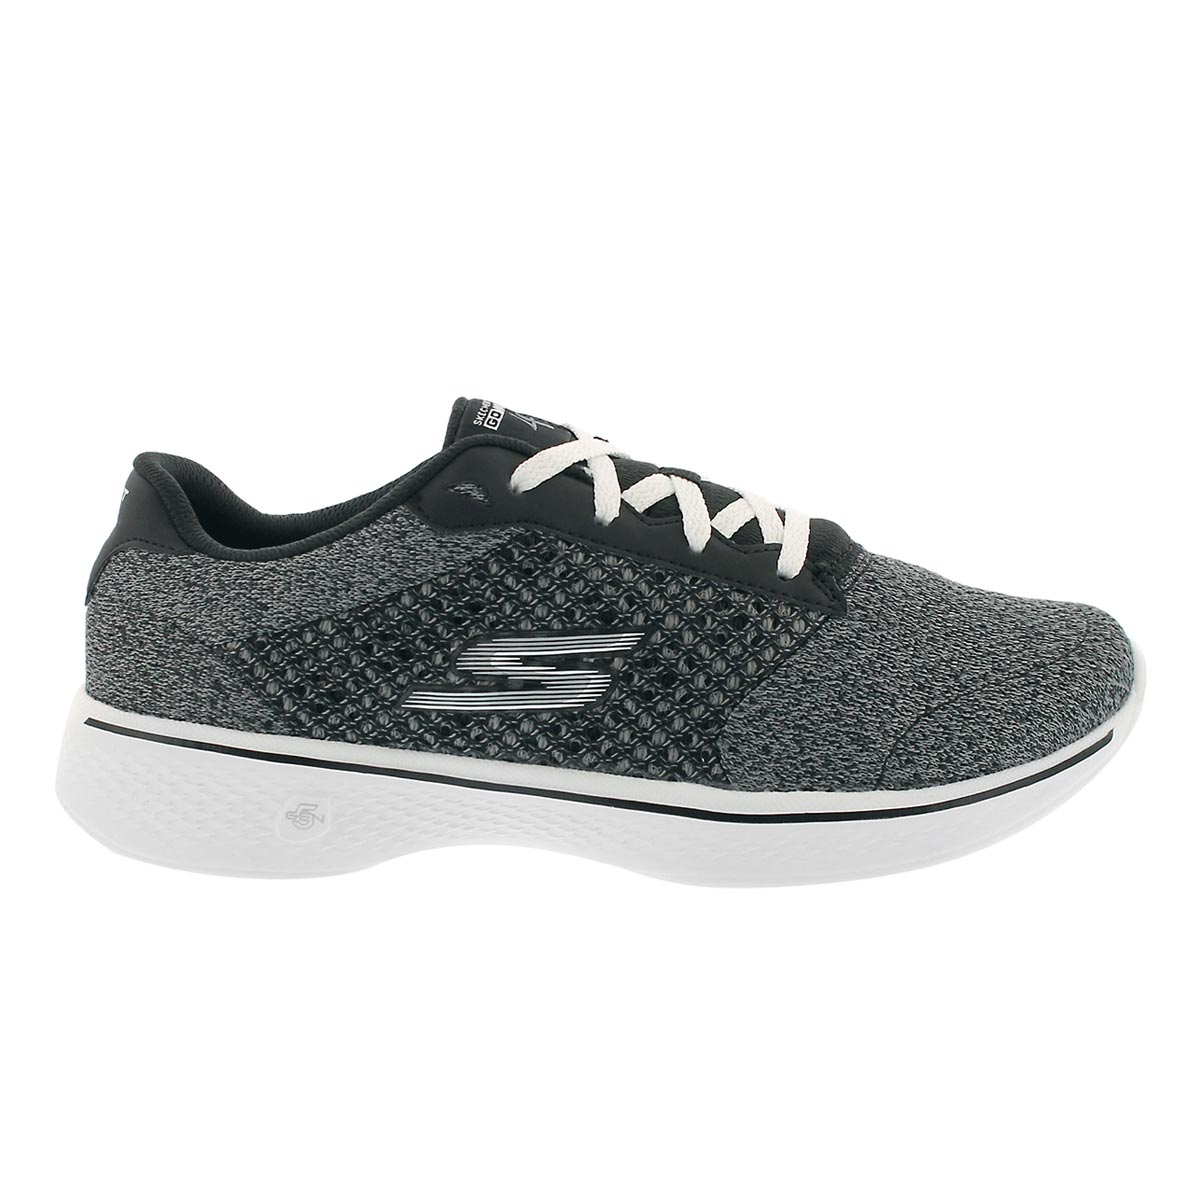 Lds GO Walk 4 Exceed bk/wt lace up shoe